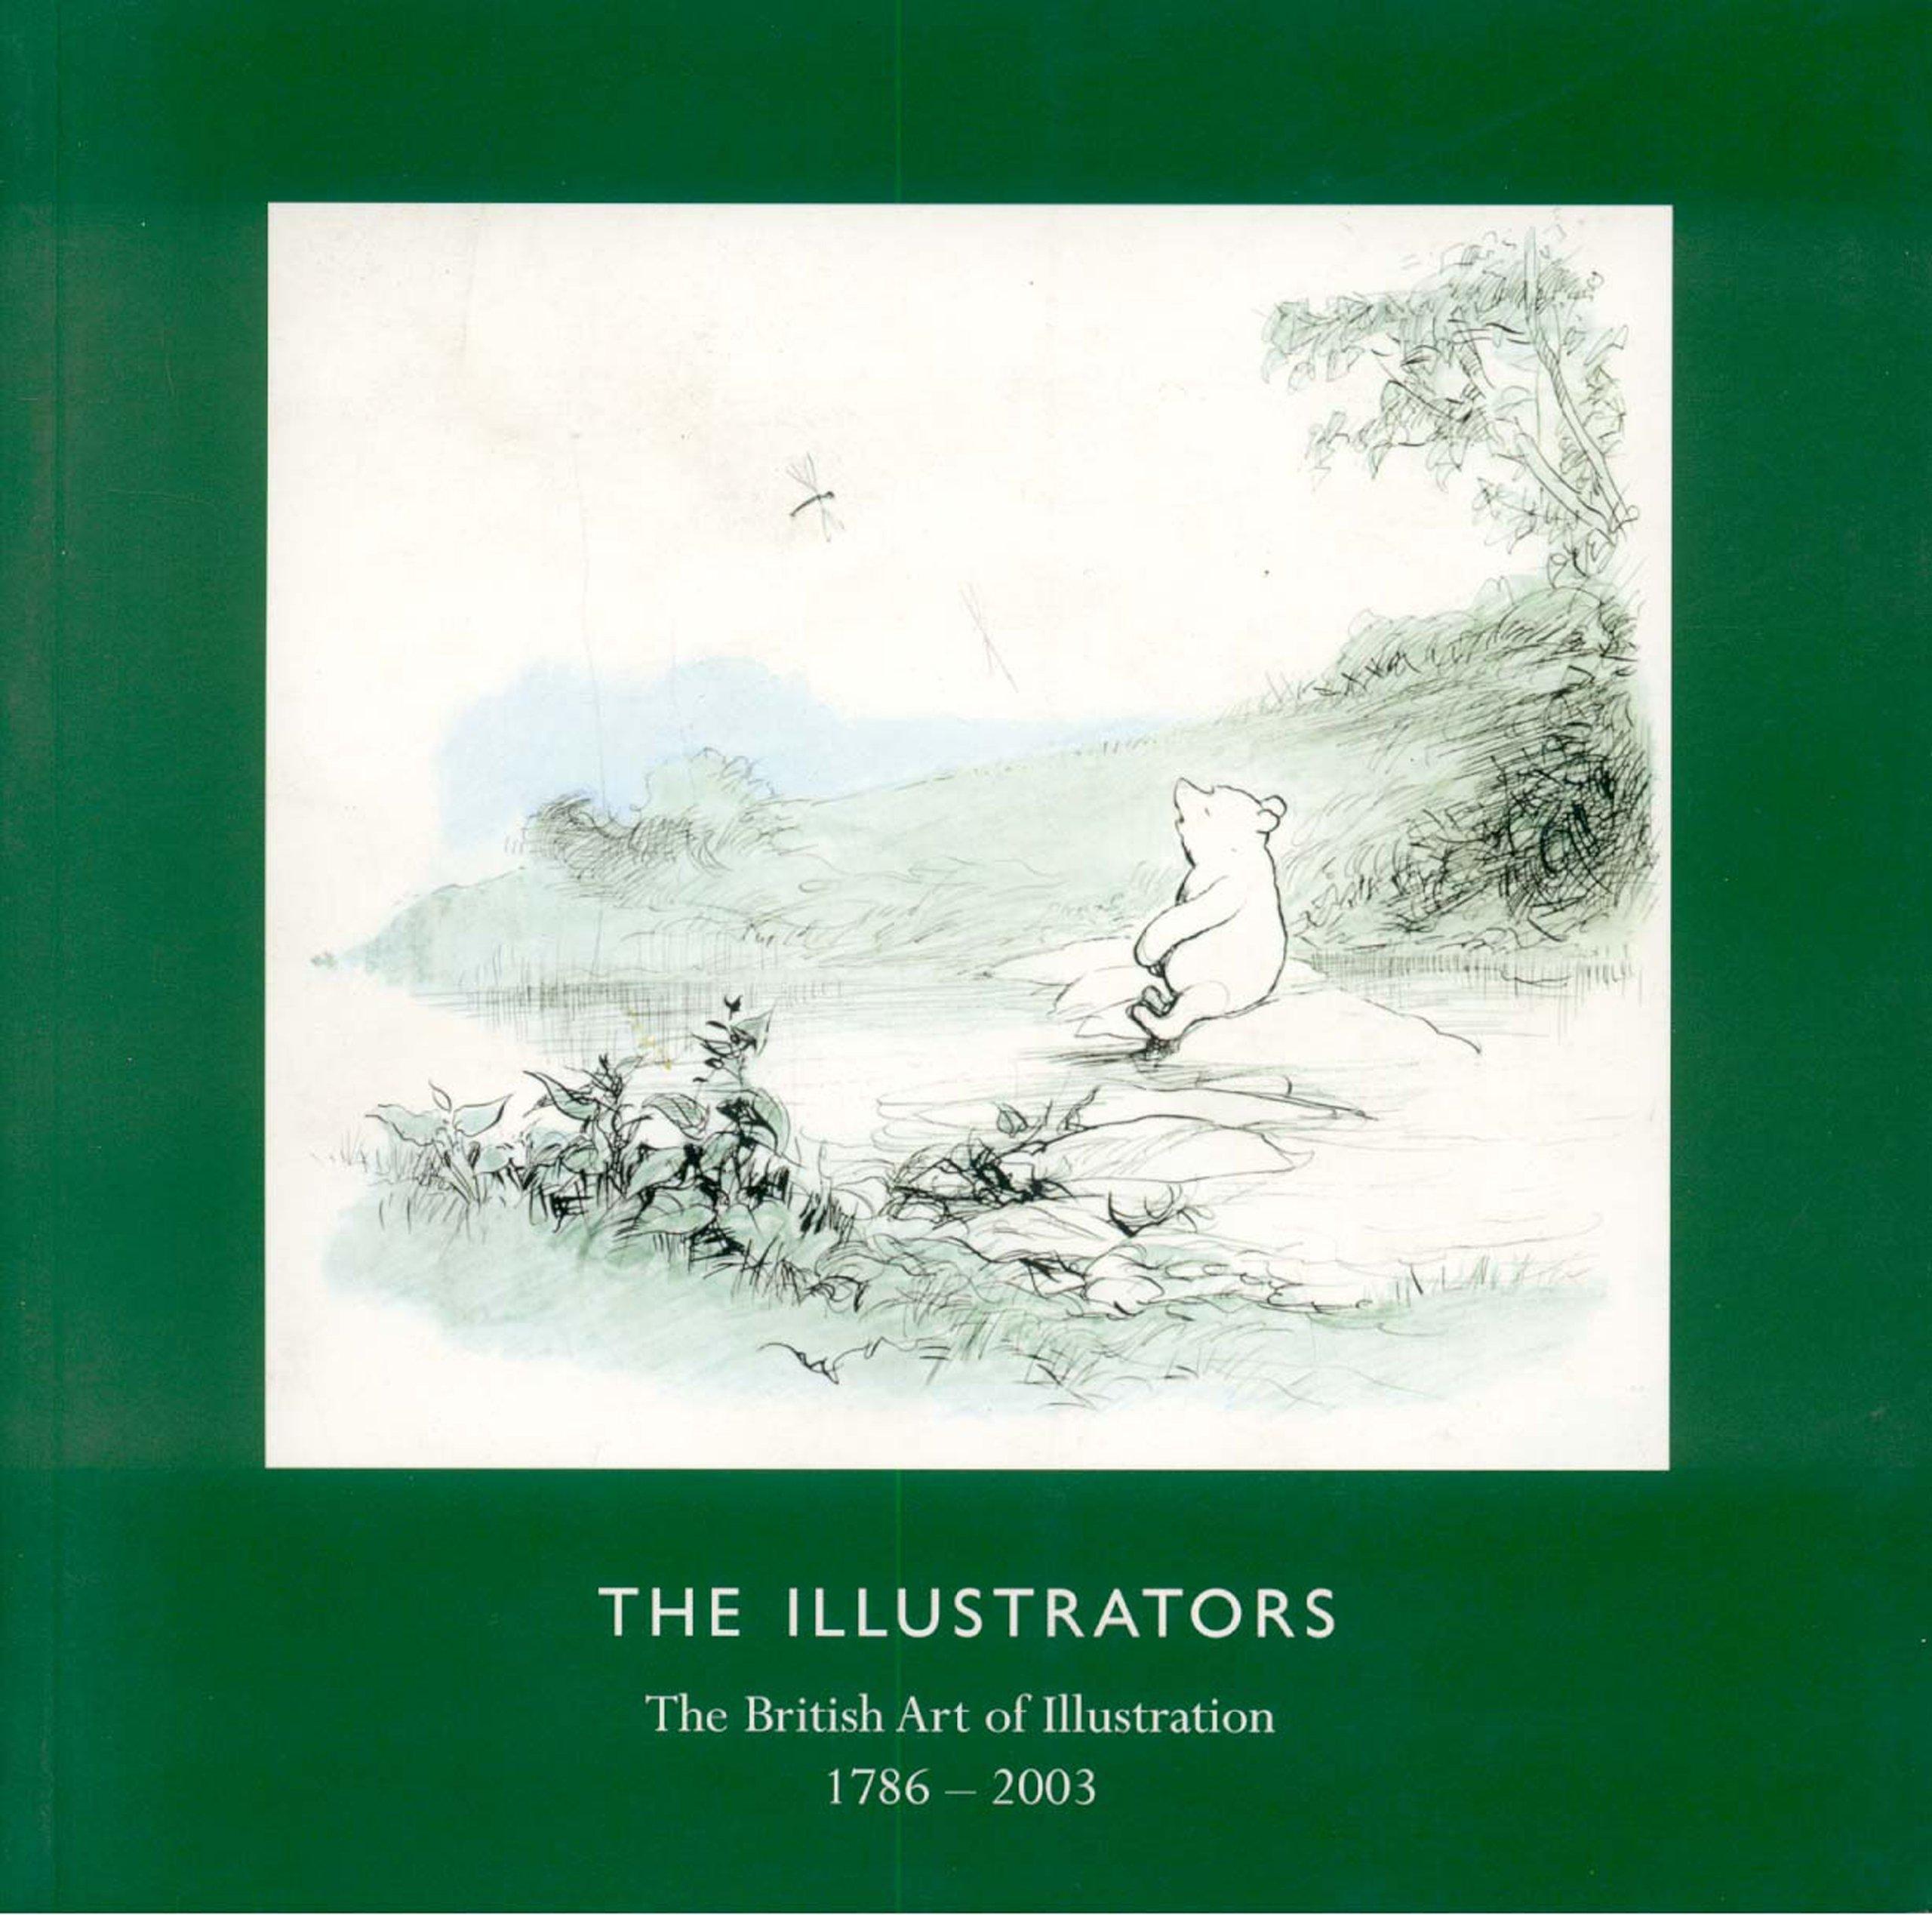 Download Illustrators 1786 - 2003 ebook